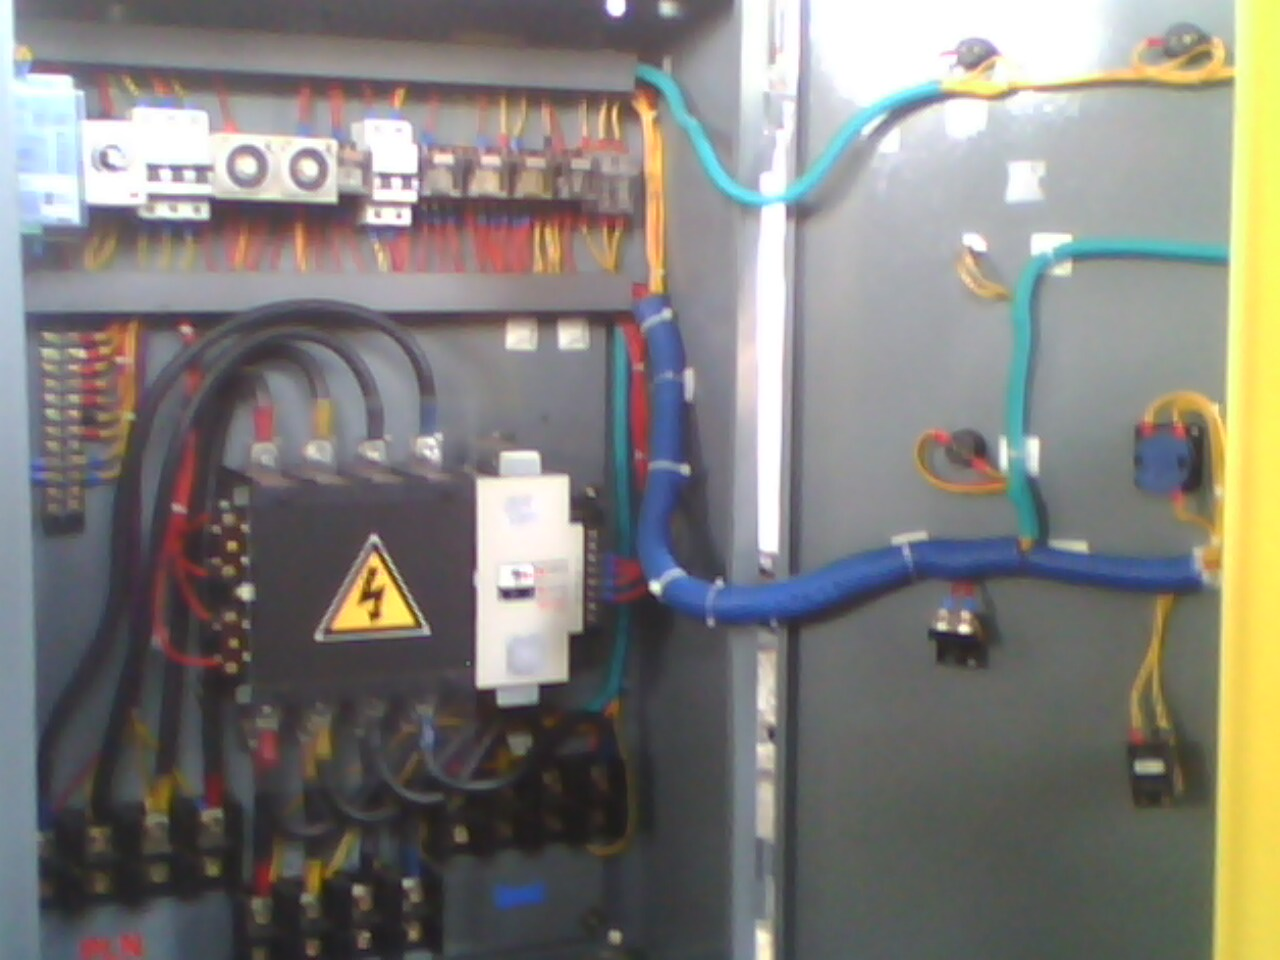 Installation Of Electrical Panels Instalasi Panel Listrik Ats Socomec Wiring Diagram Automatic Transfer Swicth